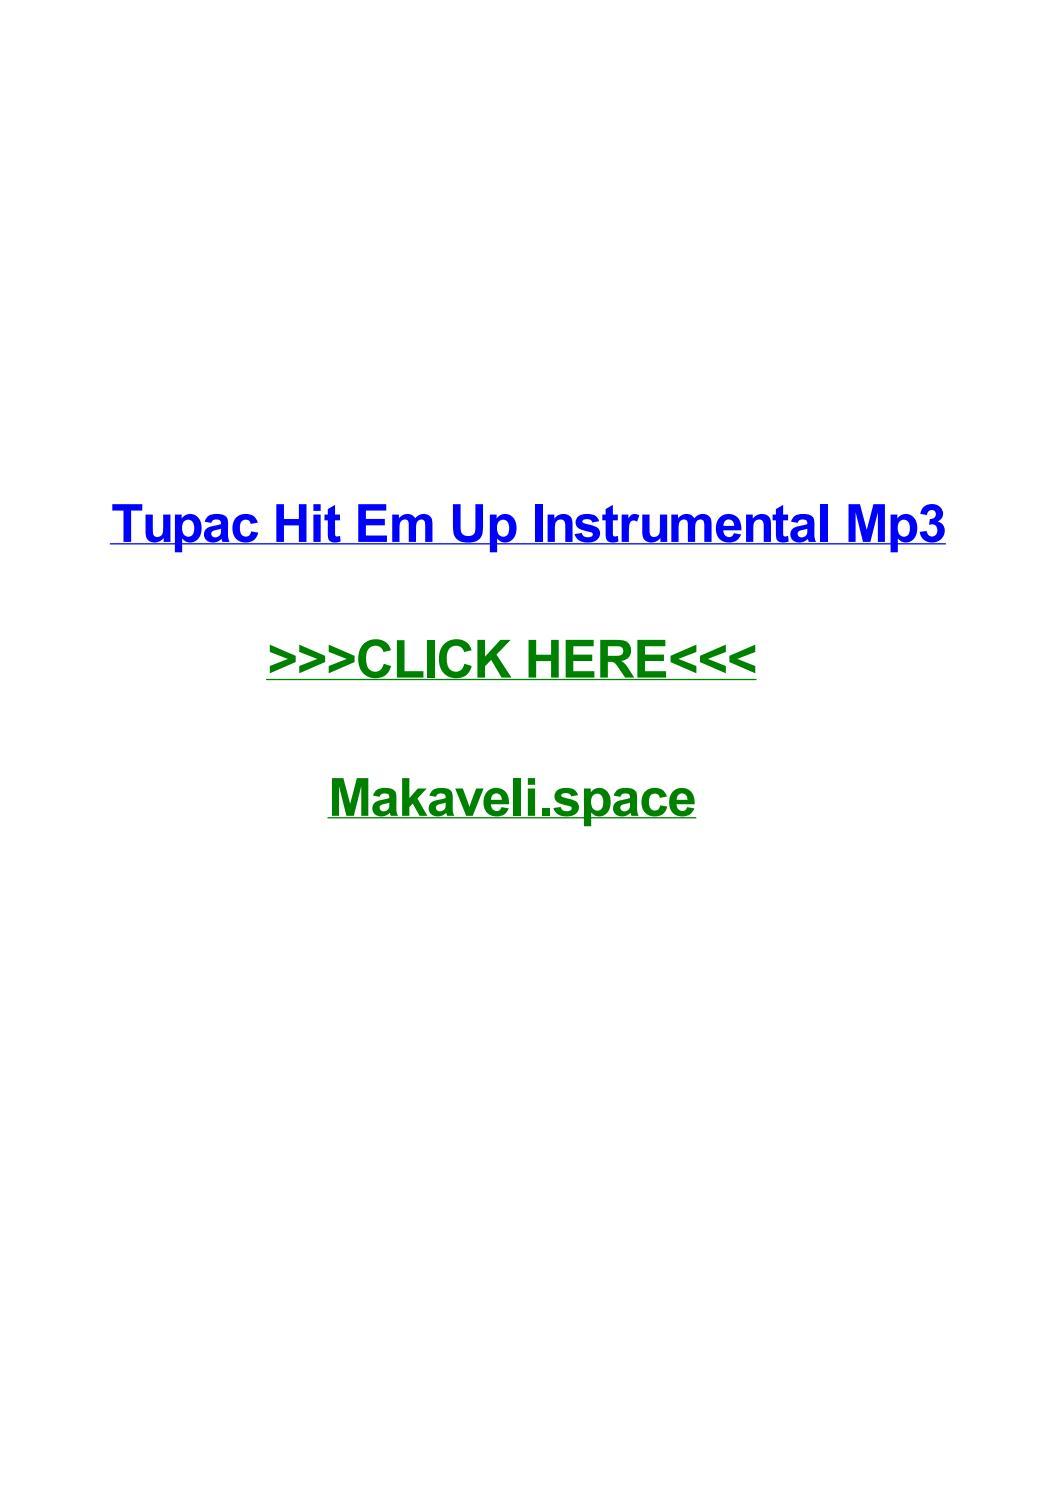 Tupac hit em up instrumental mp3 by kerryazss - issuu